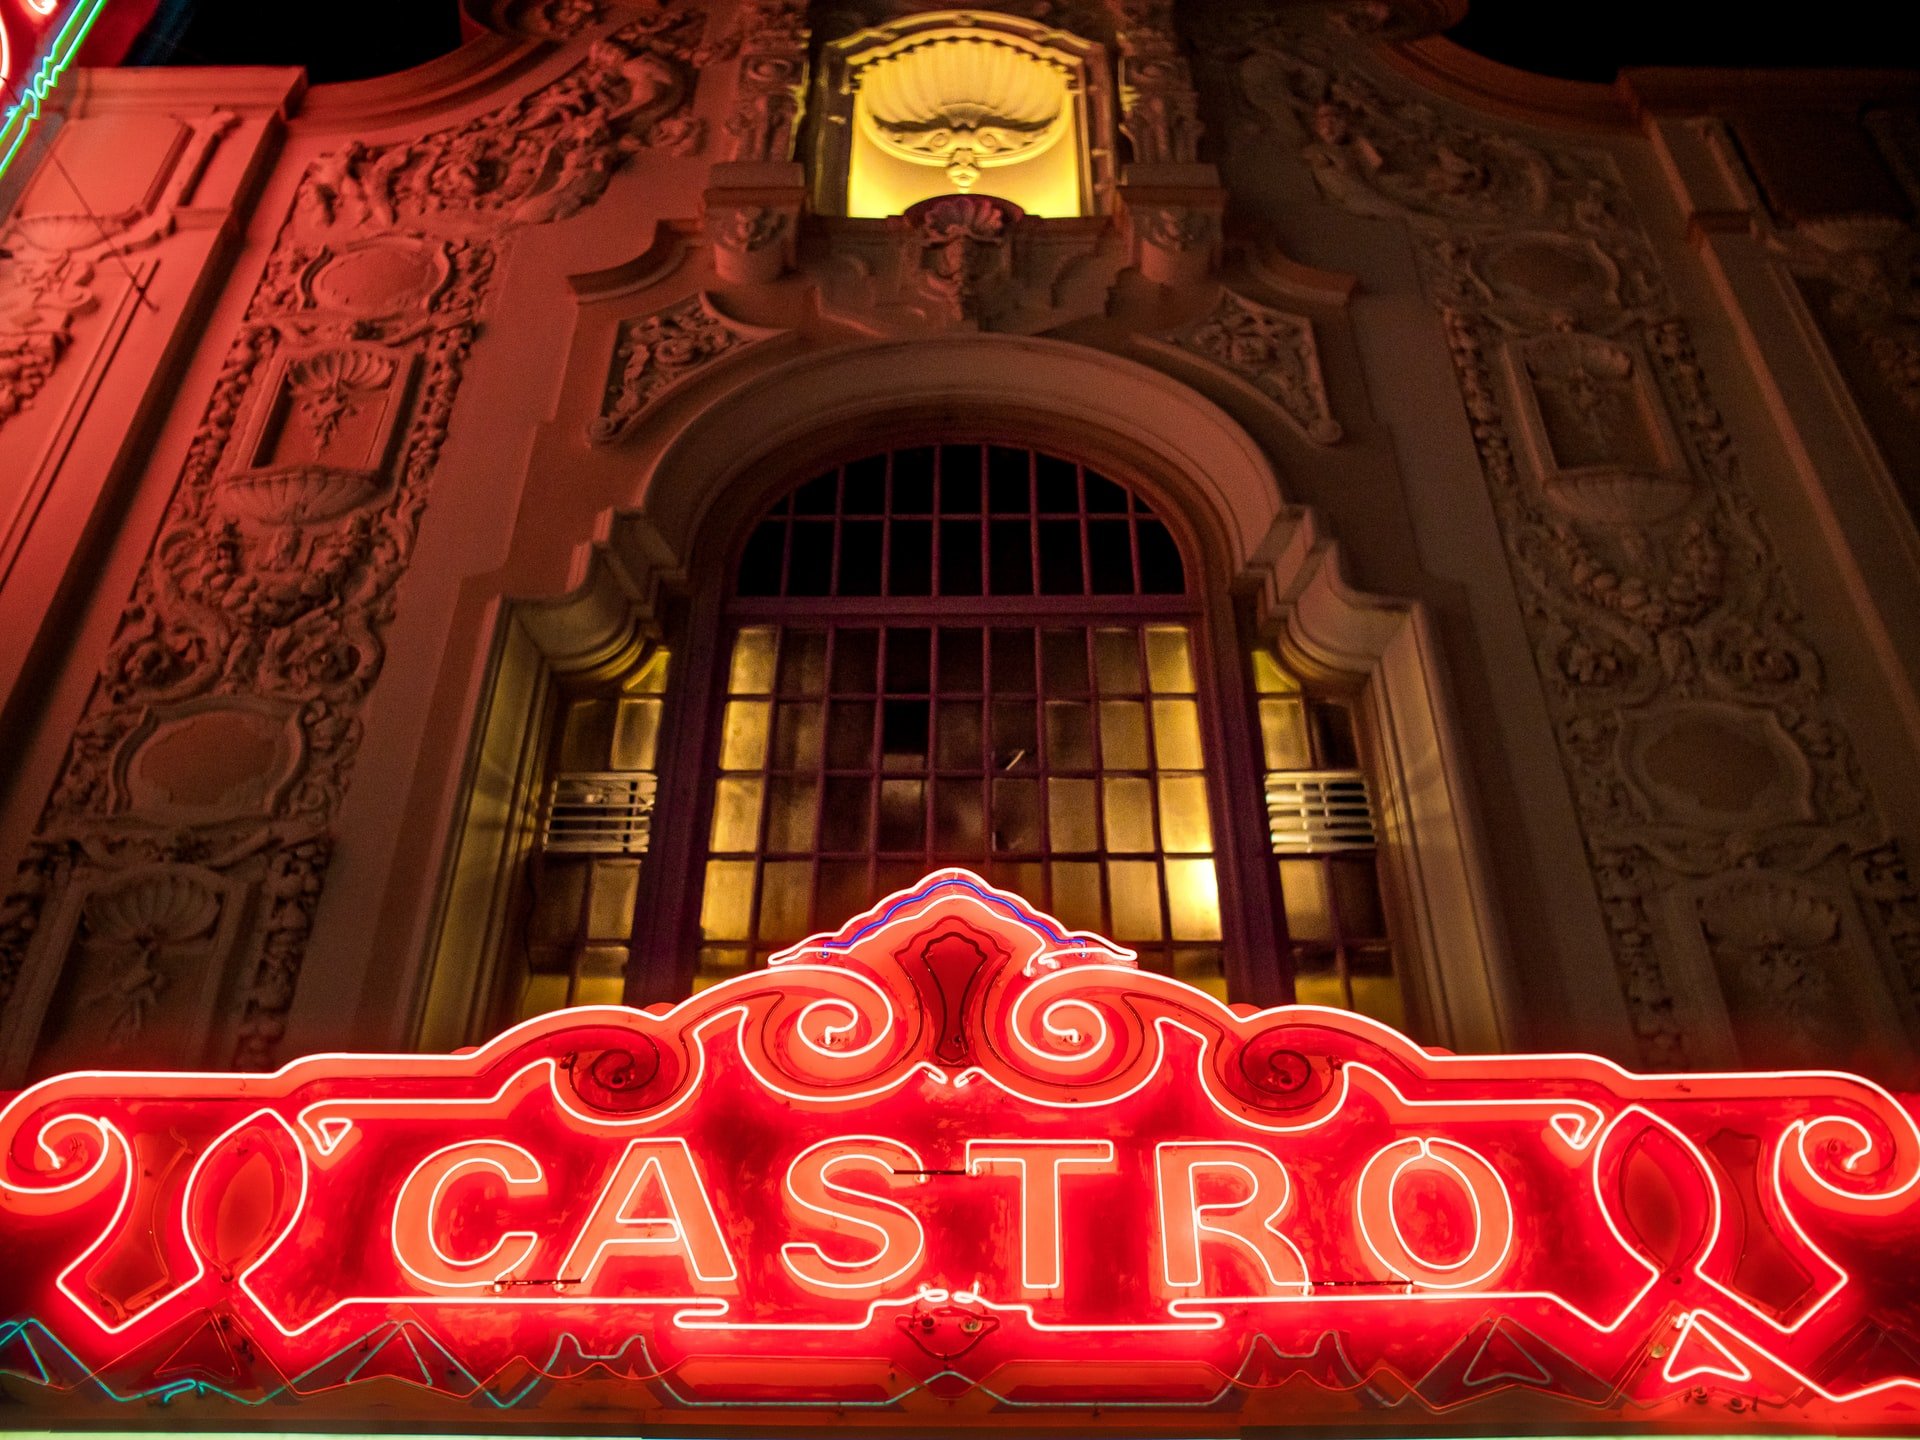 Castro Theatre at night